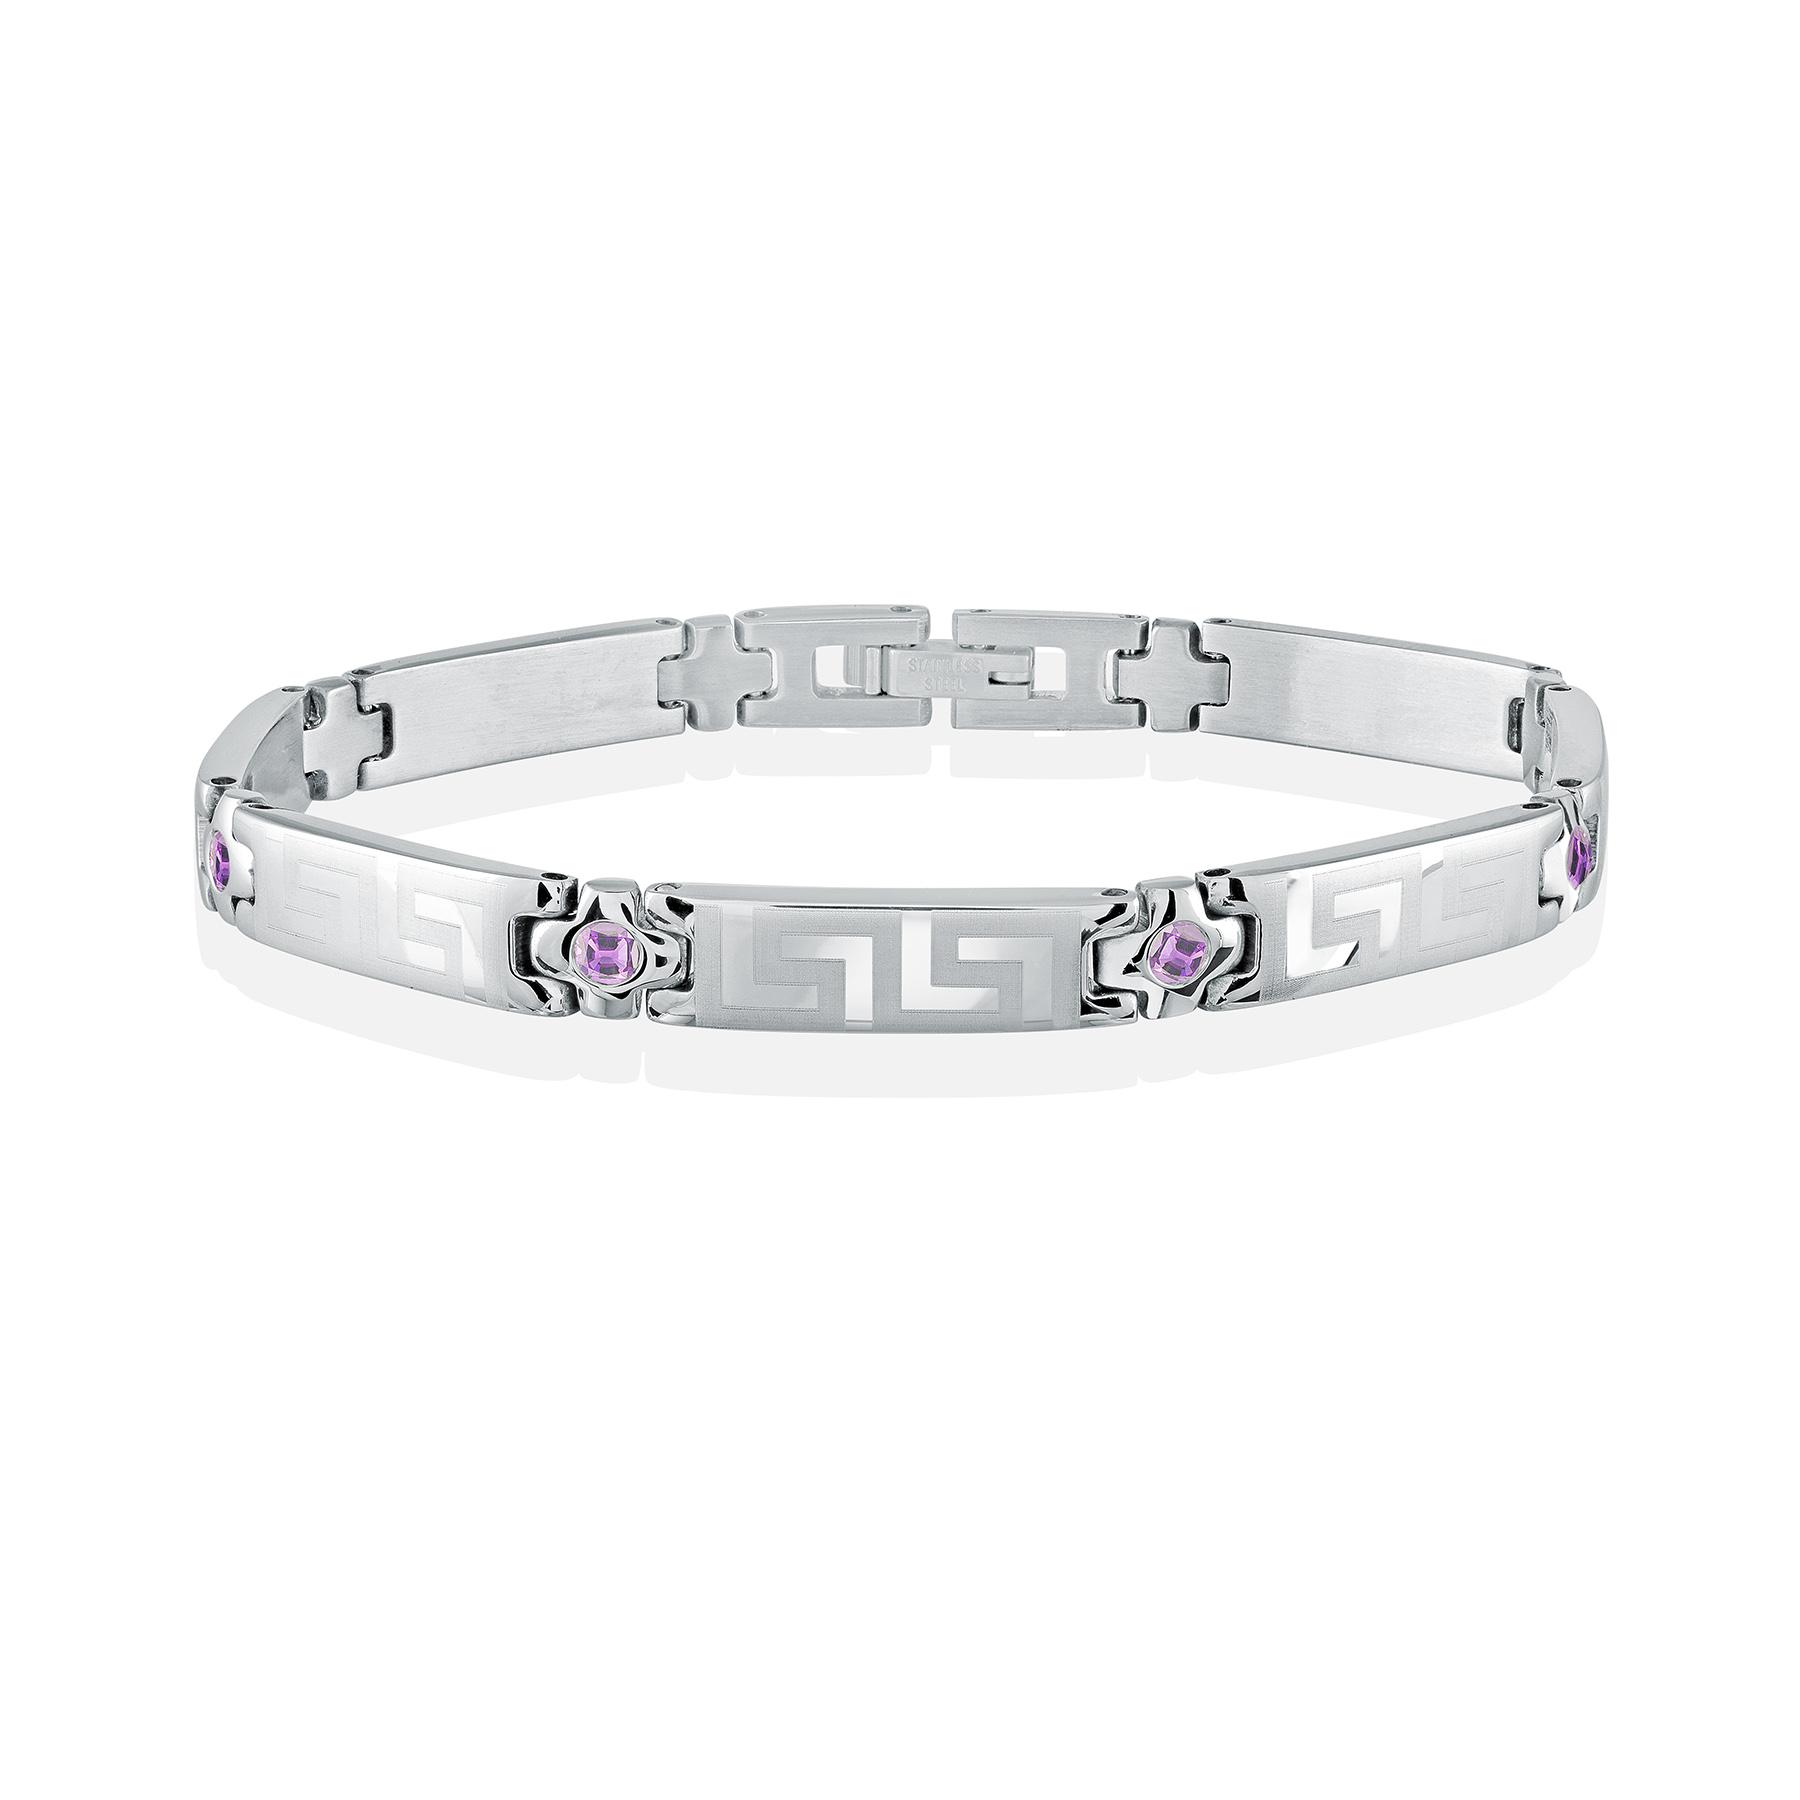 Women's bracelet - Stainless steel & Purple cubic zirconia (month of February)